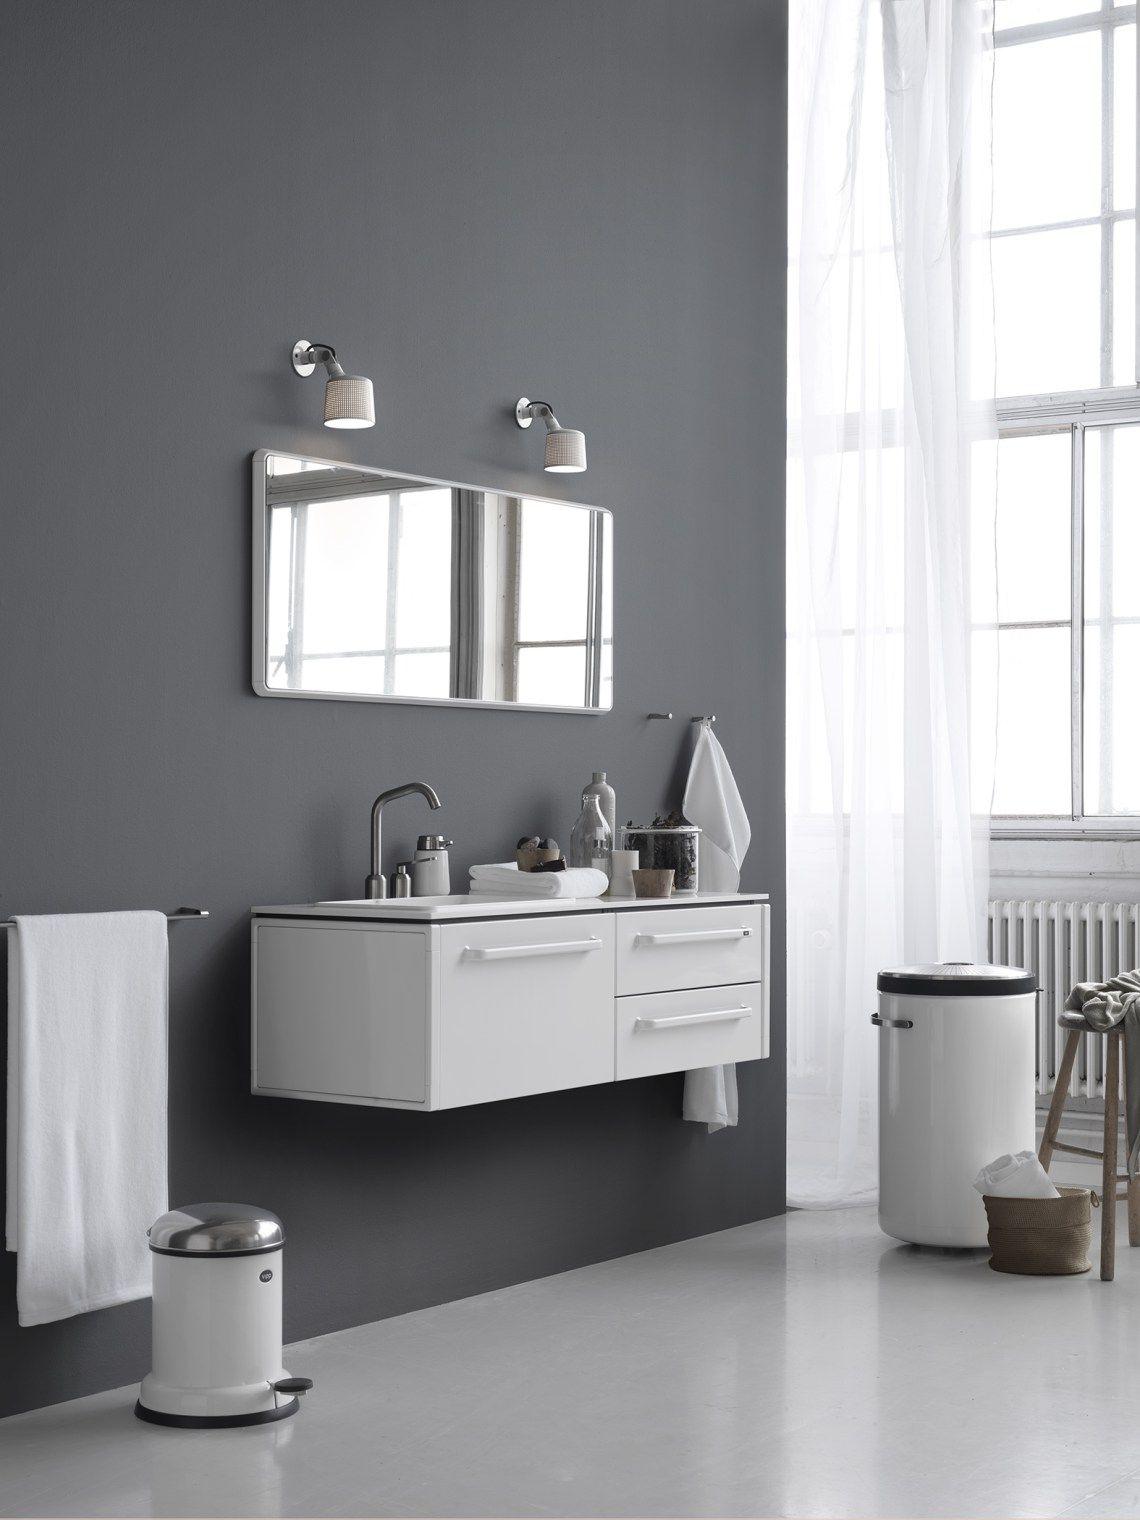 Vipp White Wall Spot Bathroom Inspiration Simple Bathroom Bathroom Interior